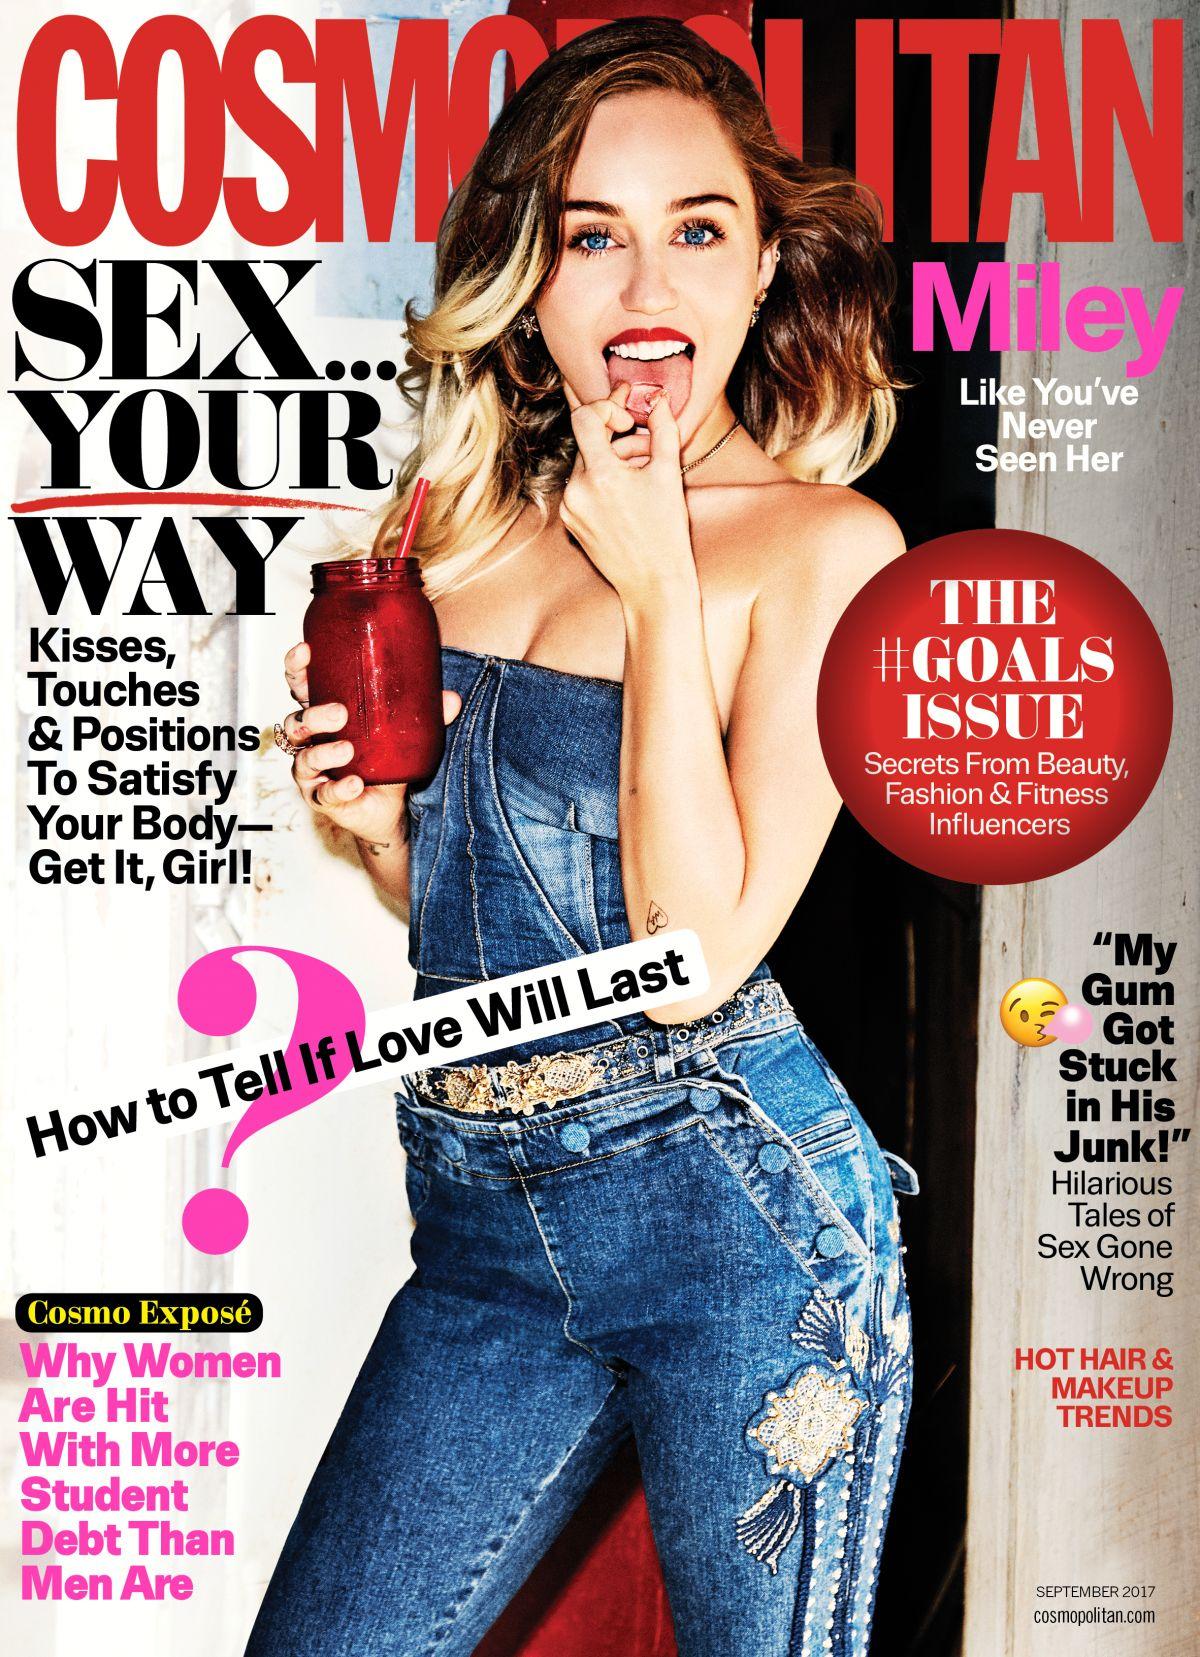 MILEY CYRUS for Cosmopolitan Magazine, September 2017